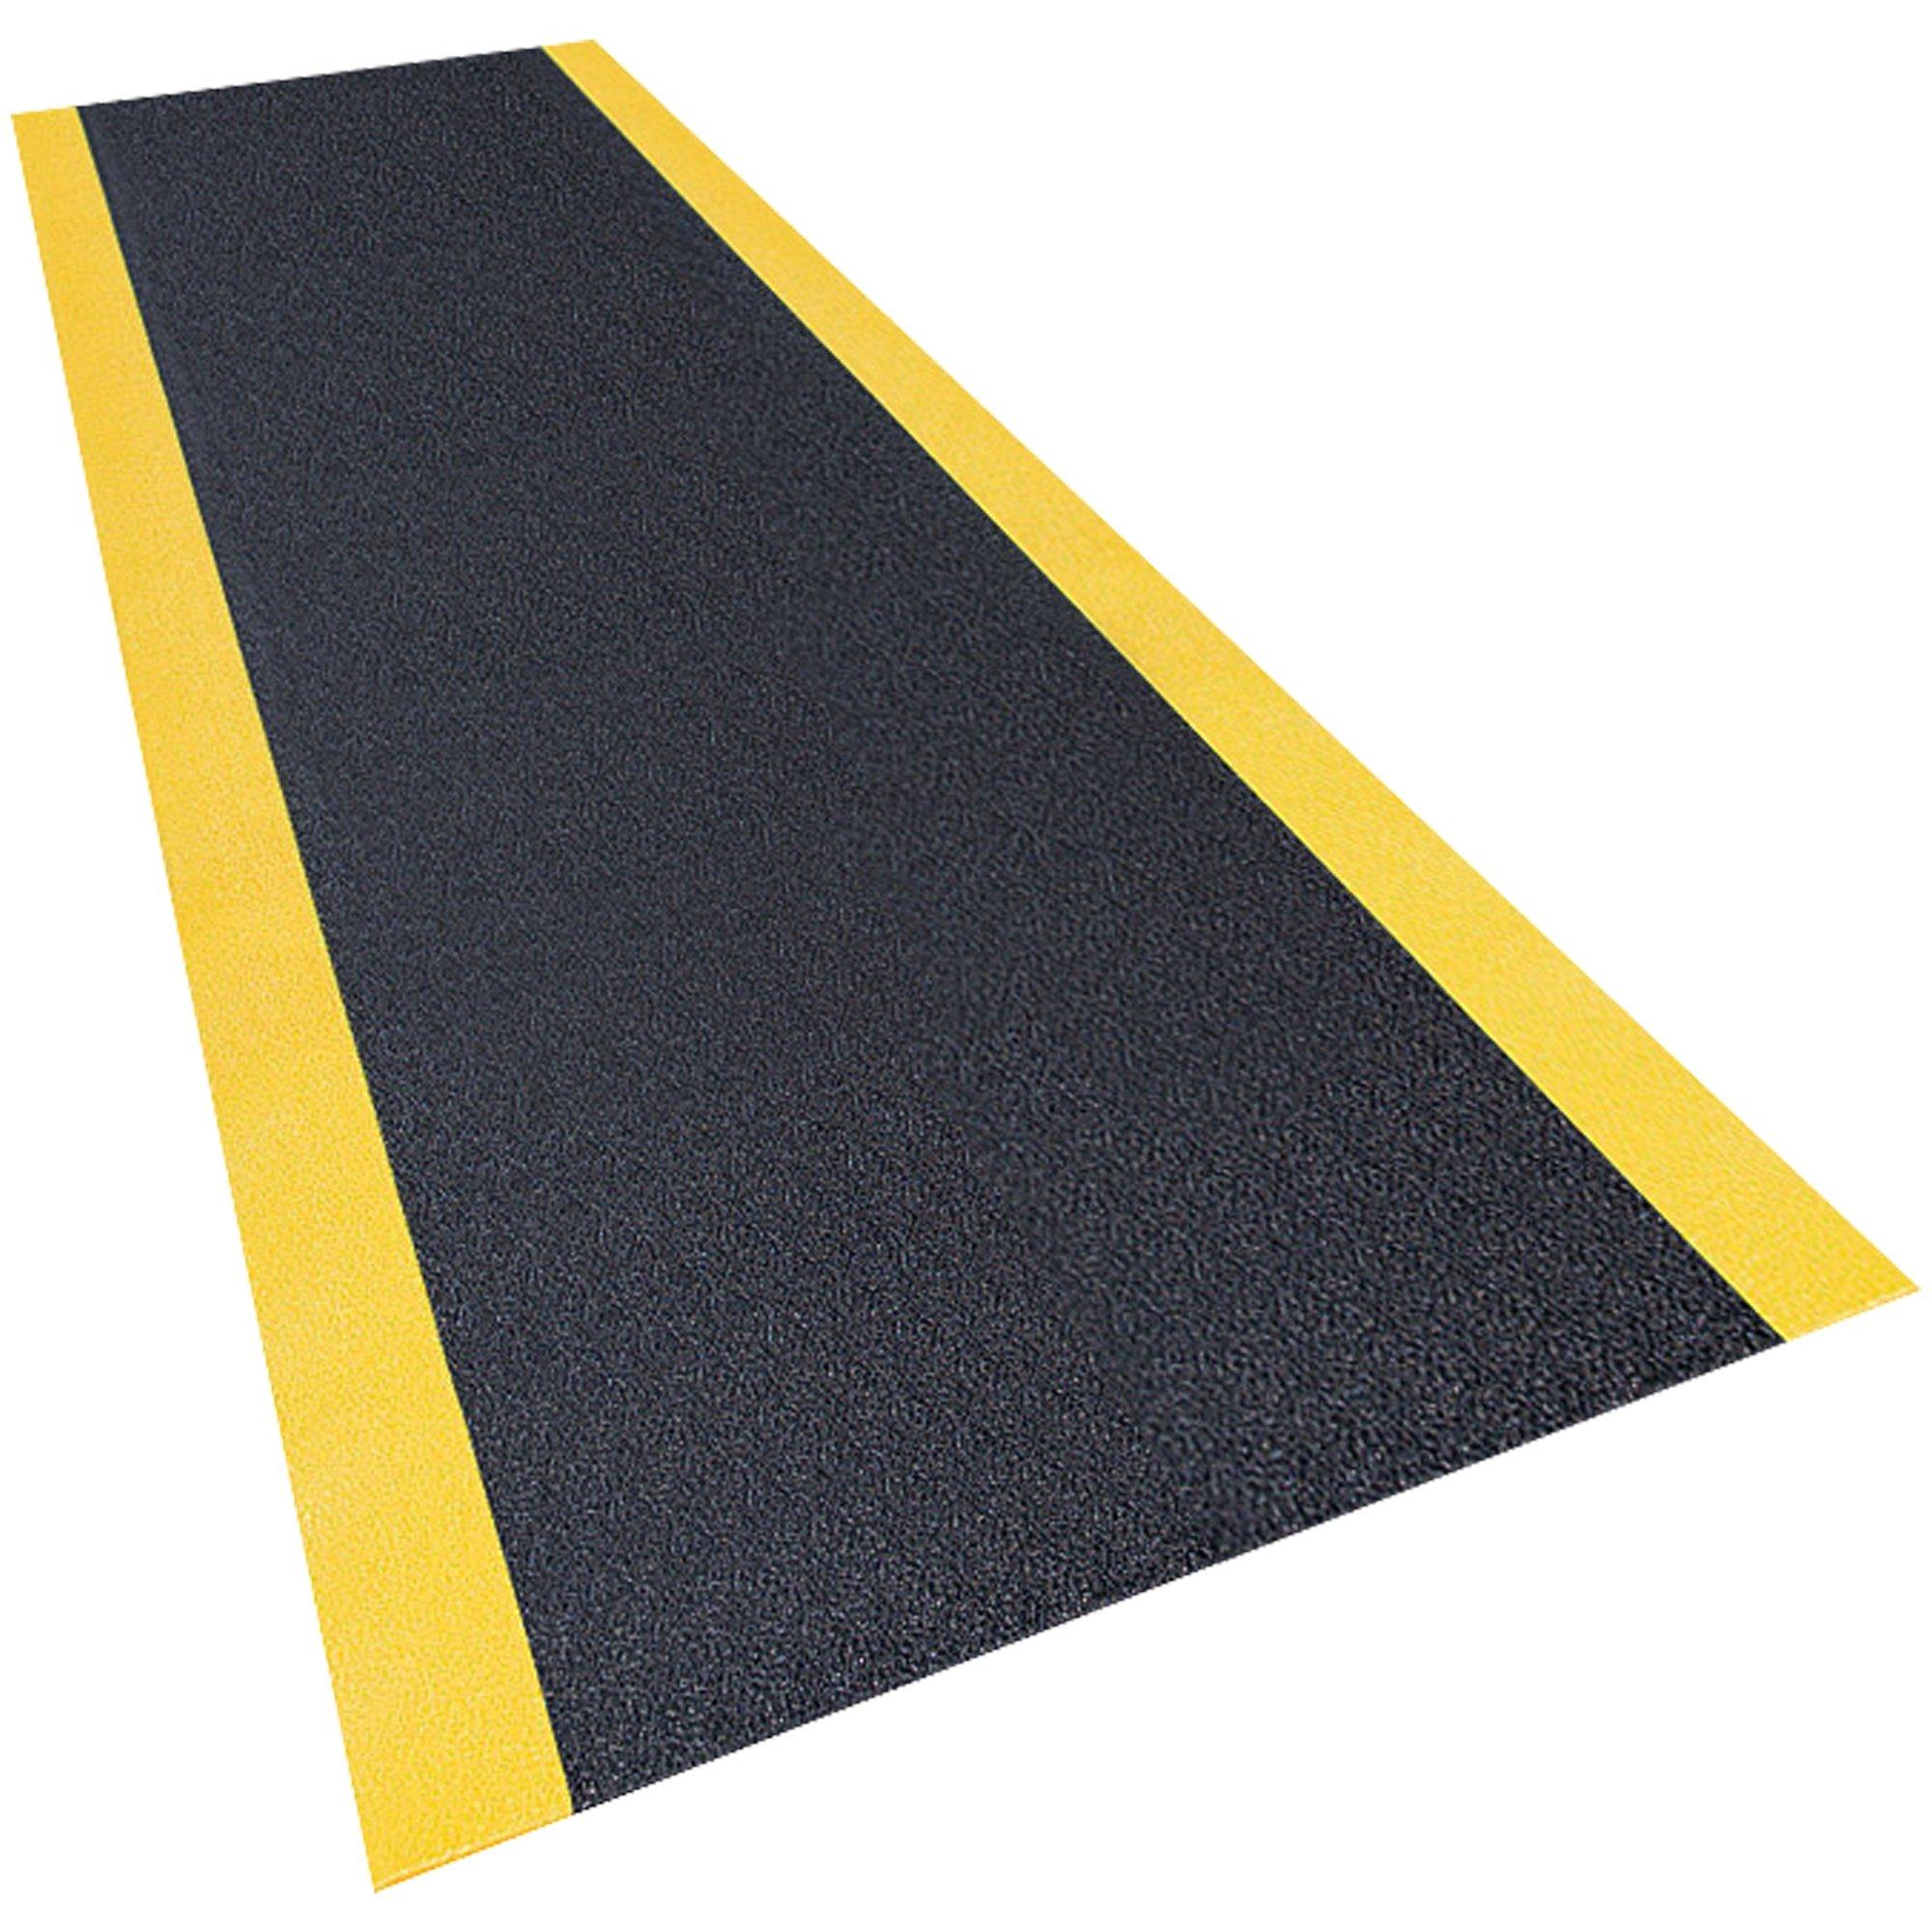 3 x 4' Black/Yellow Premium Anti-Fatigue Mat